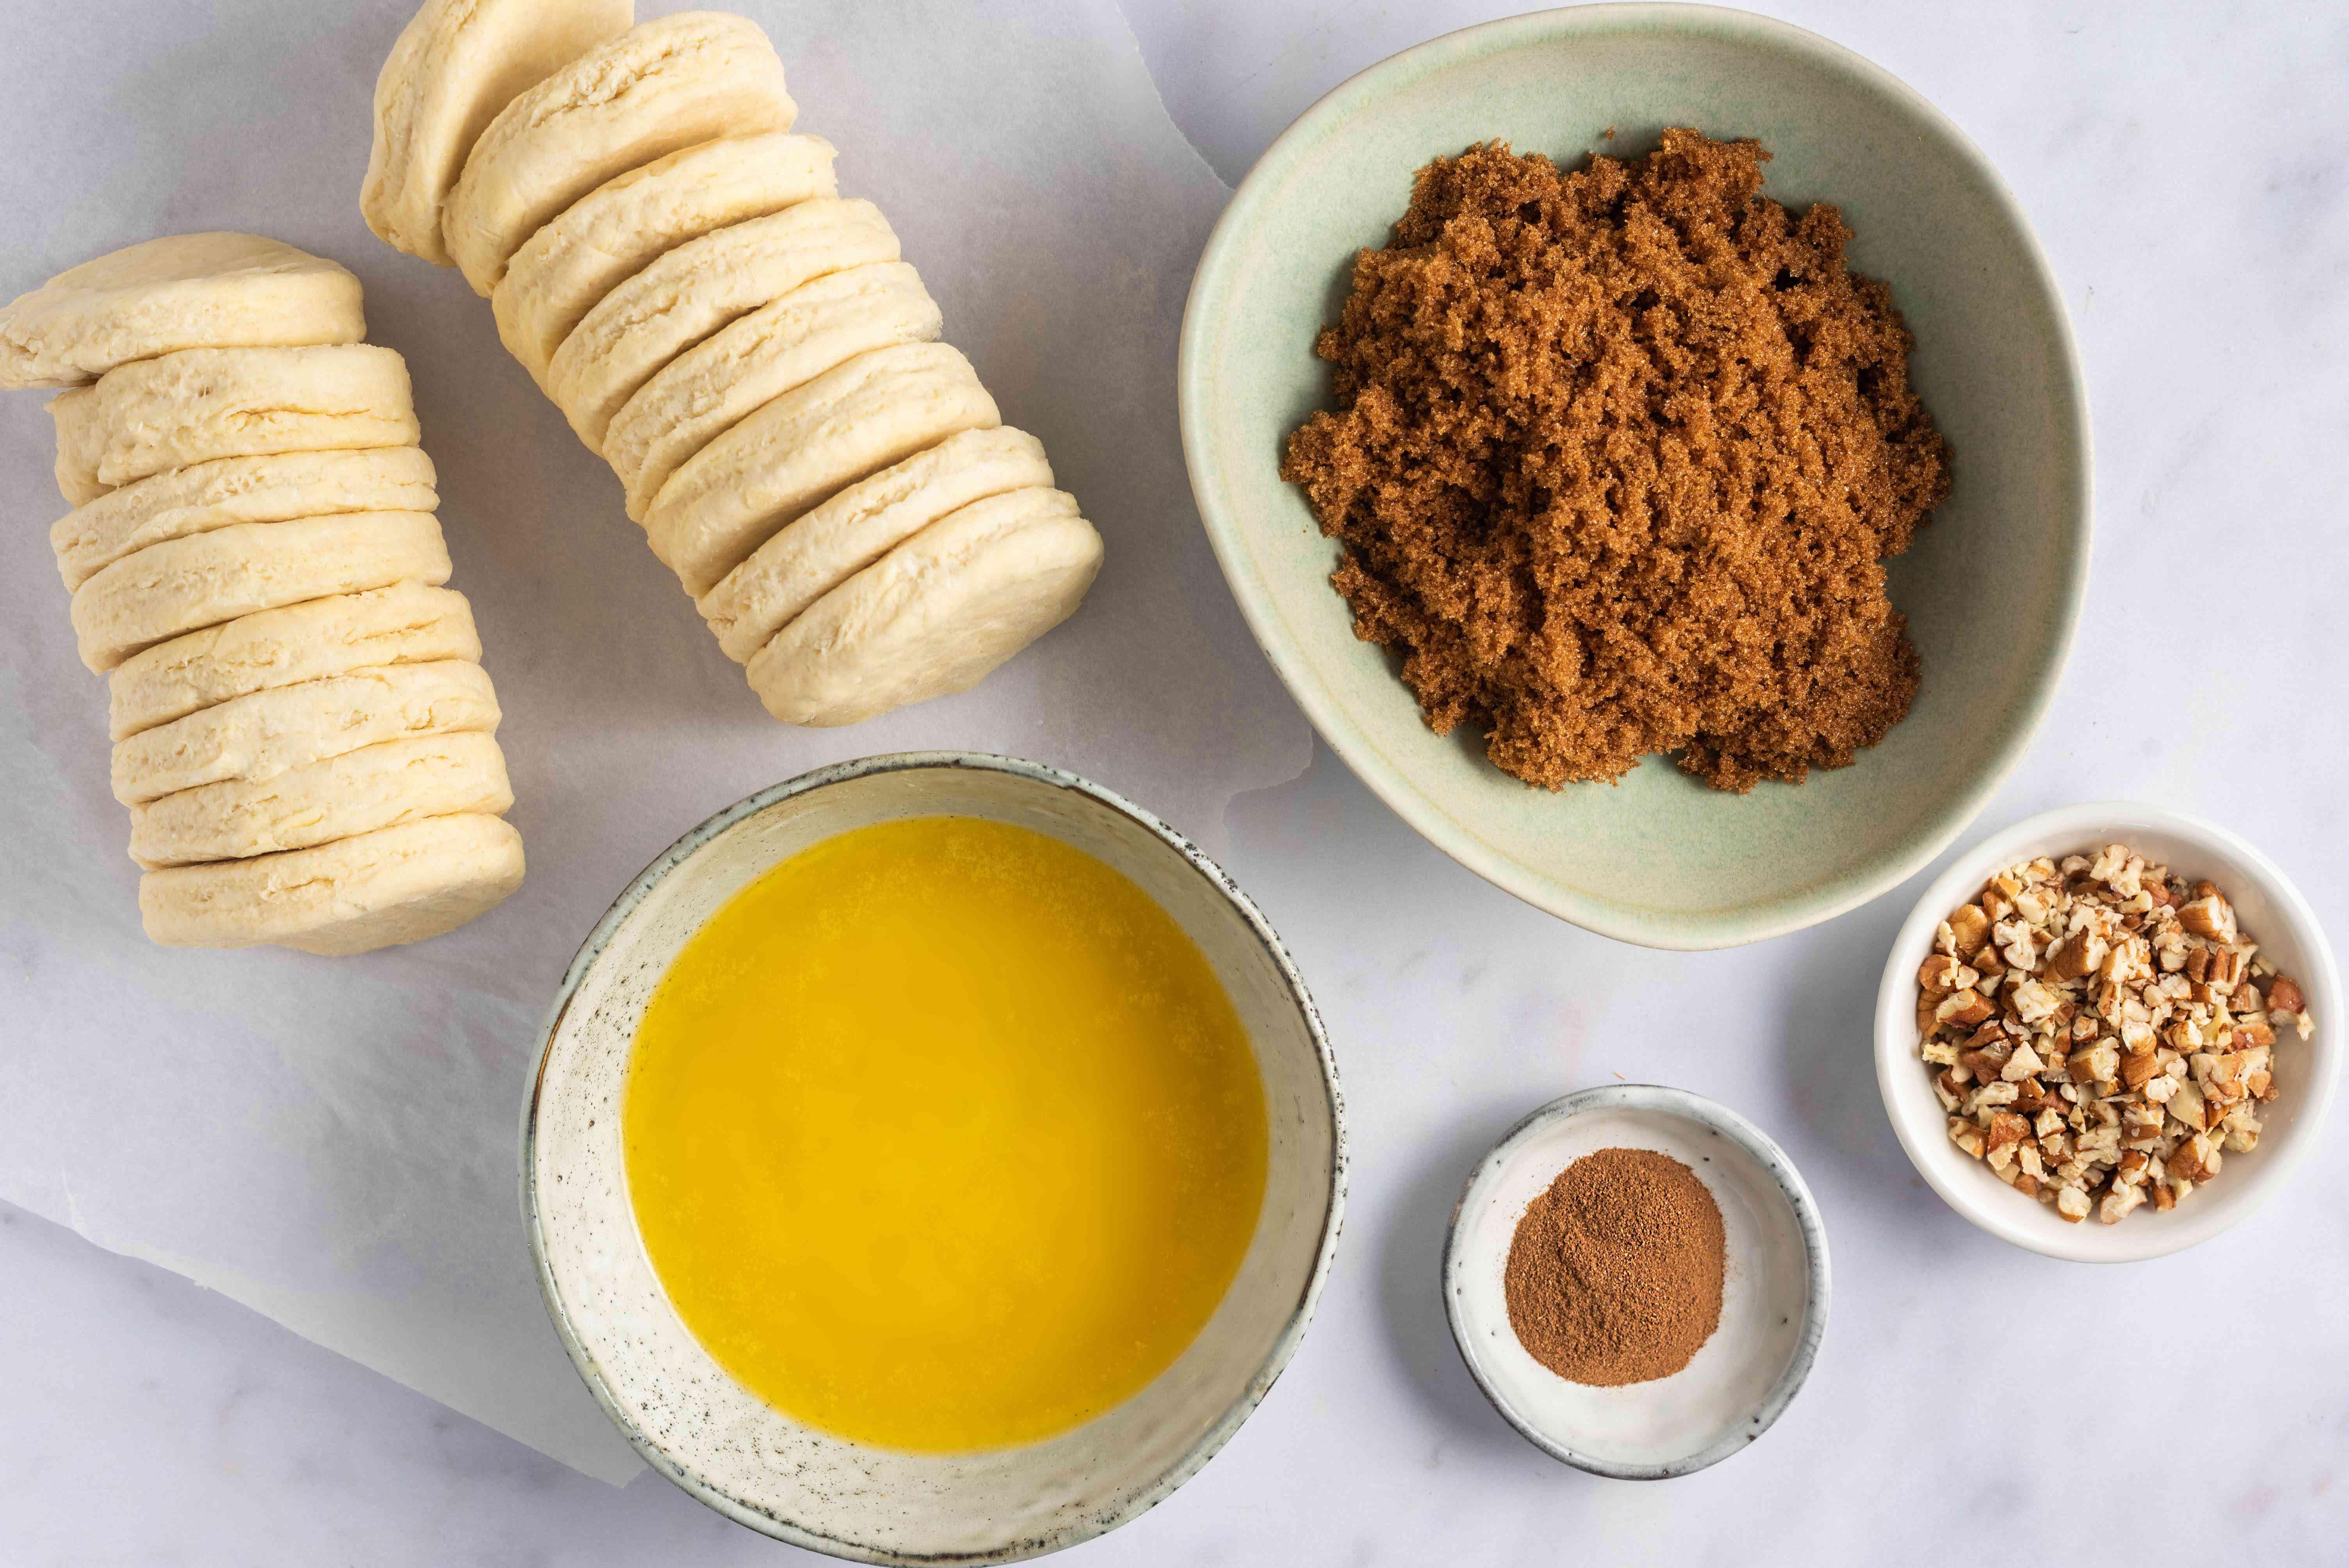 Ingredients for crockpot caramel pecan sticky buns